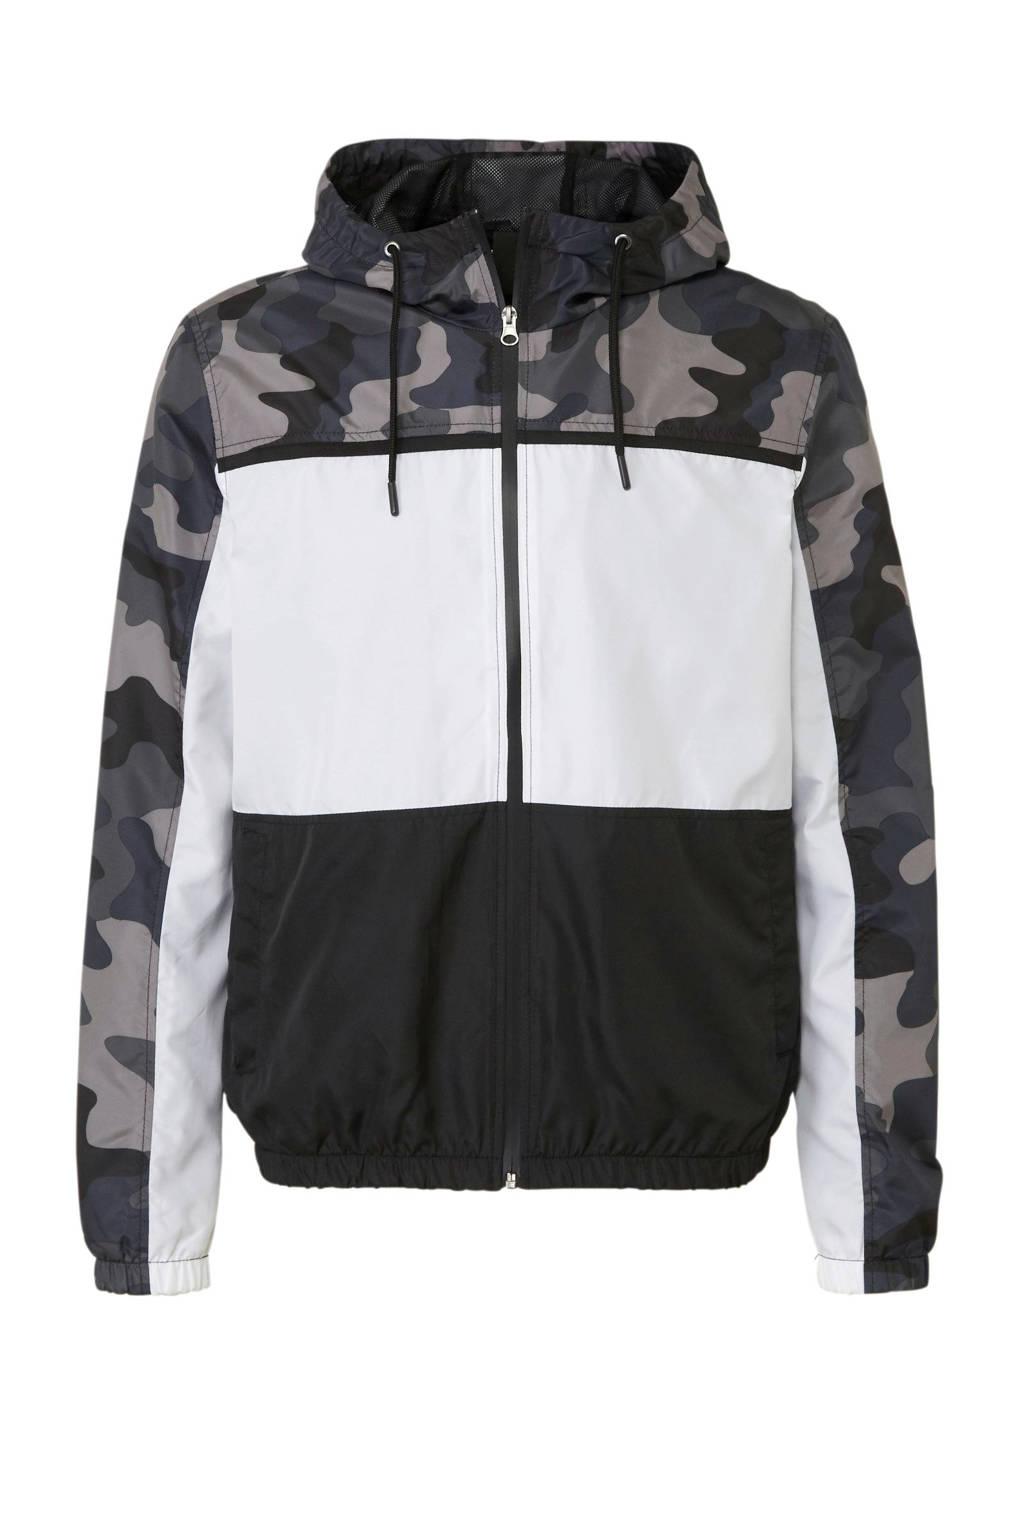 C&A Clockhouse jack, Wit/zwart/camouflage